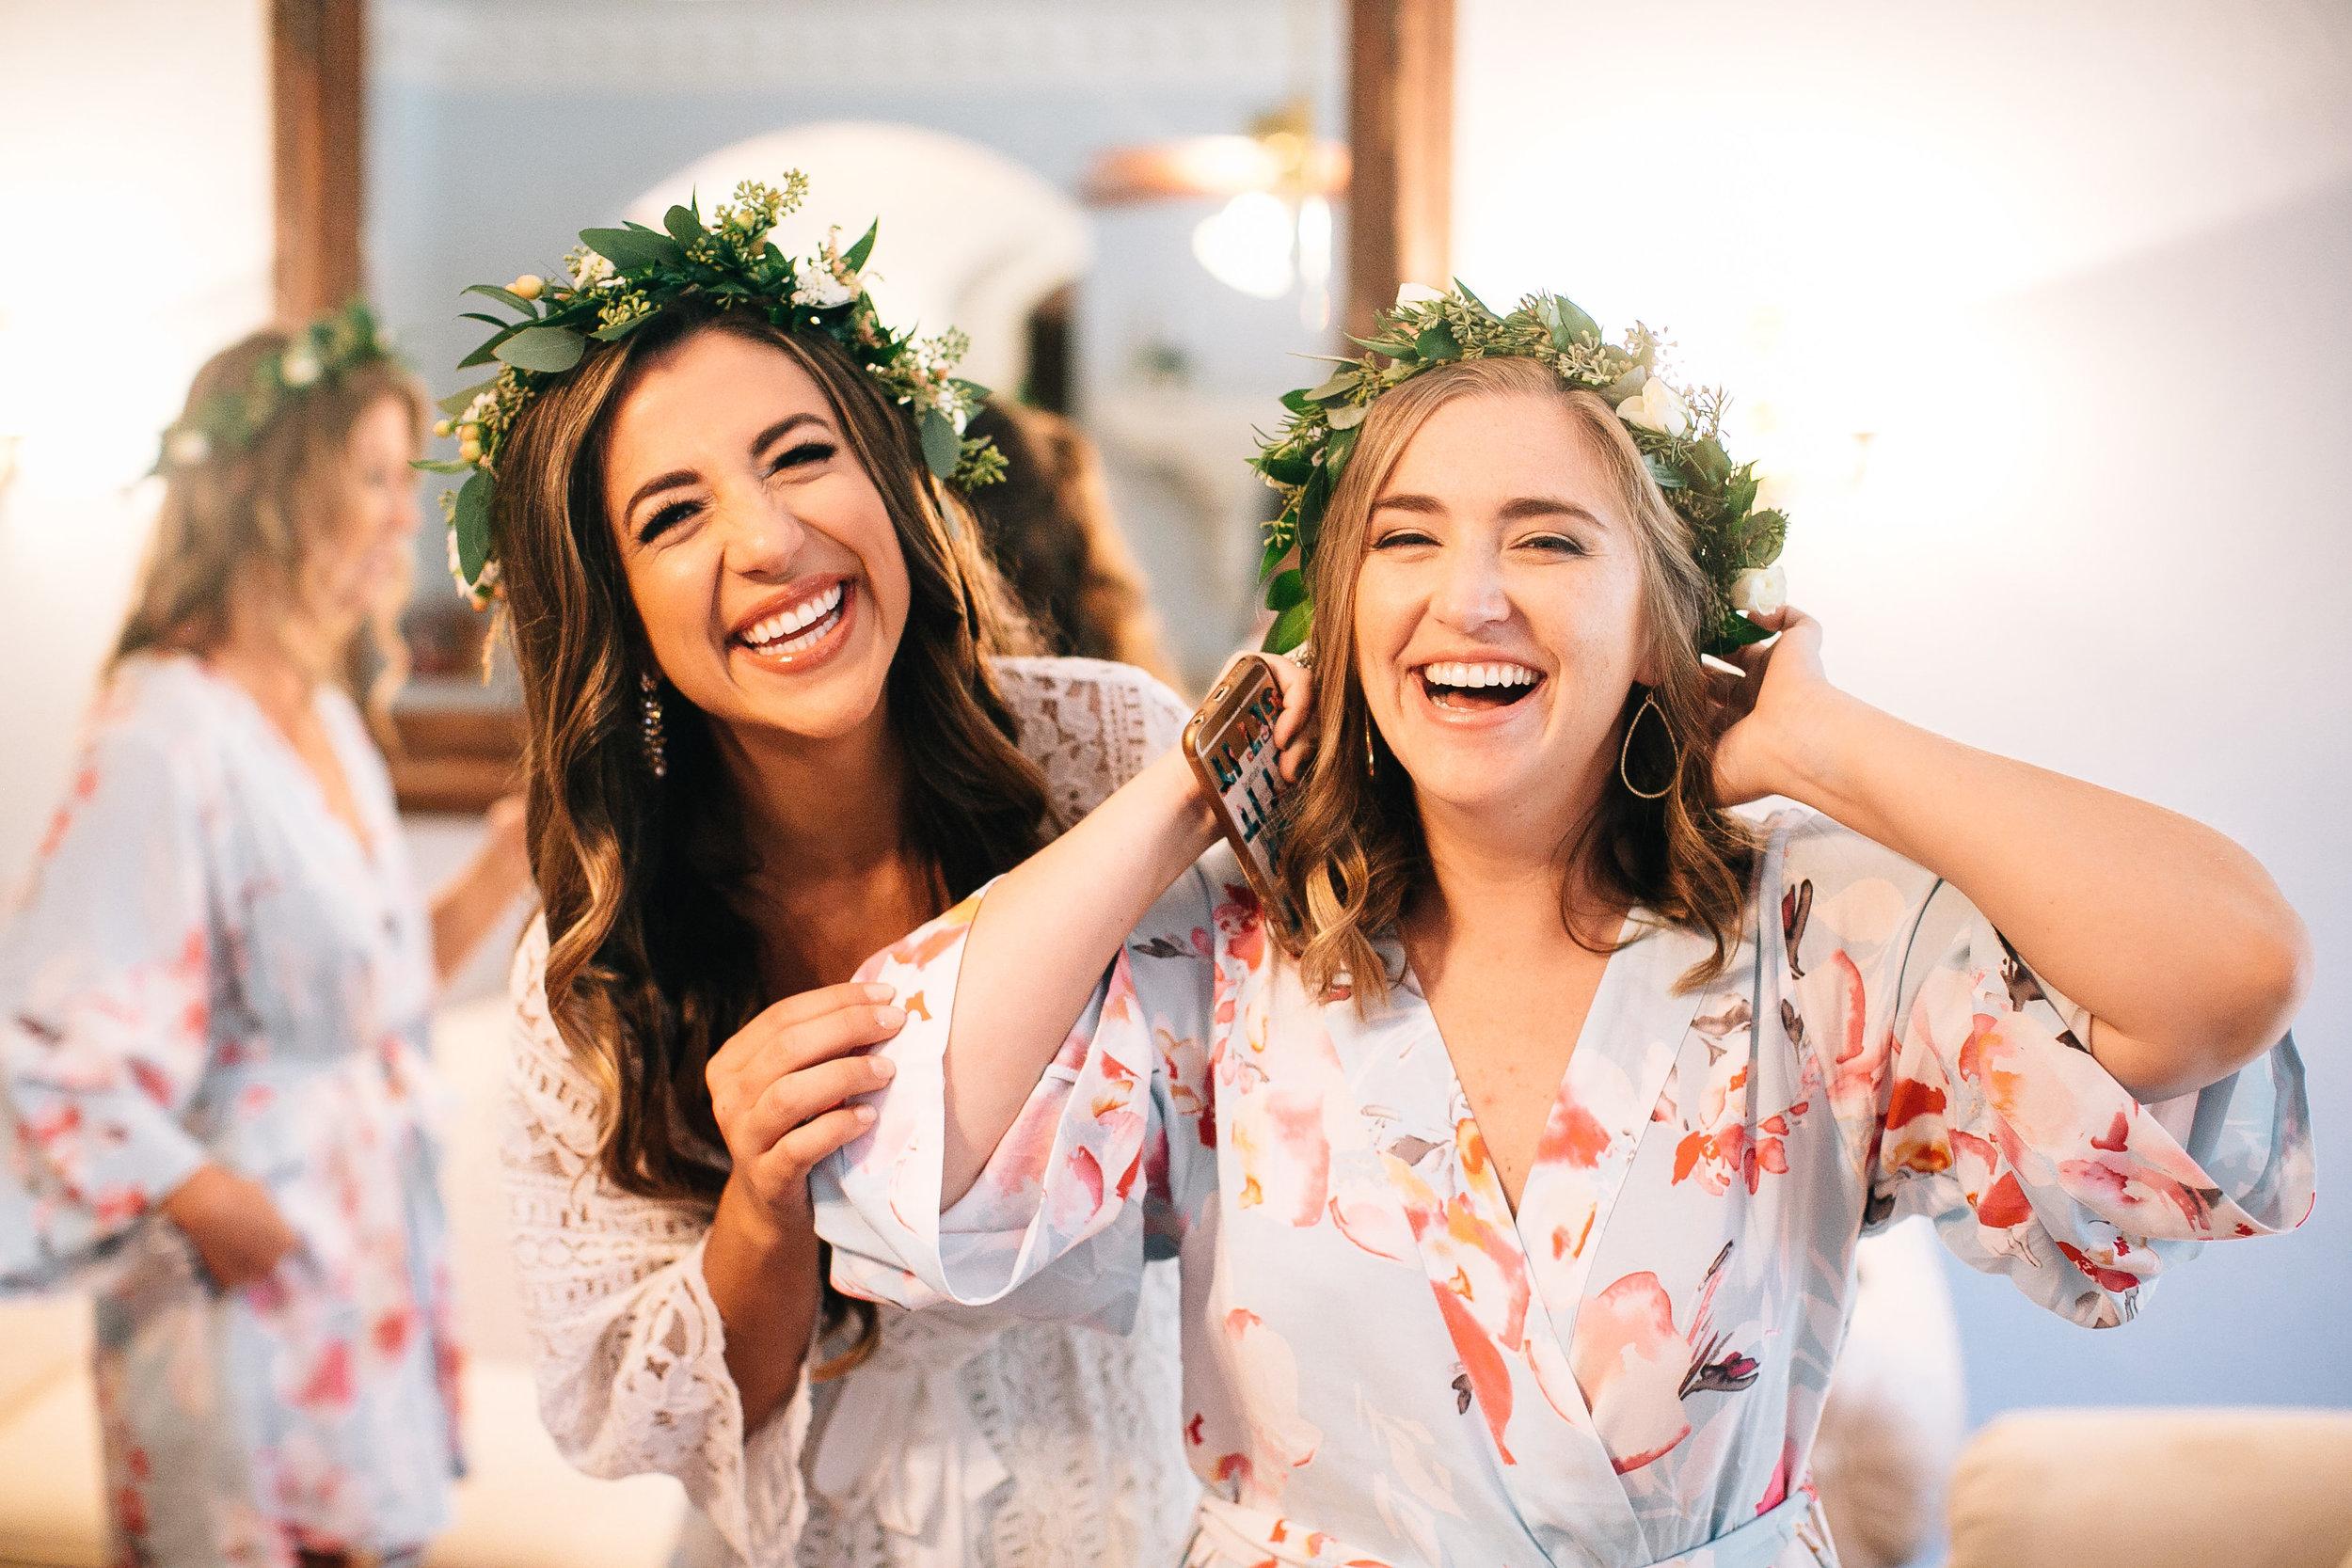 Bride & Bridesmaids wearing flower crowns in Florida Wedding